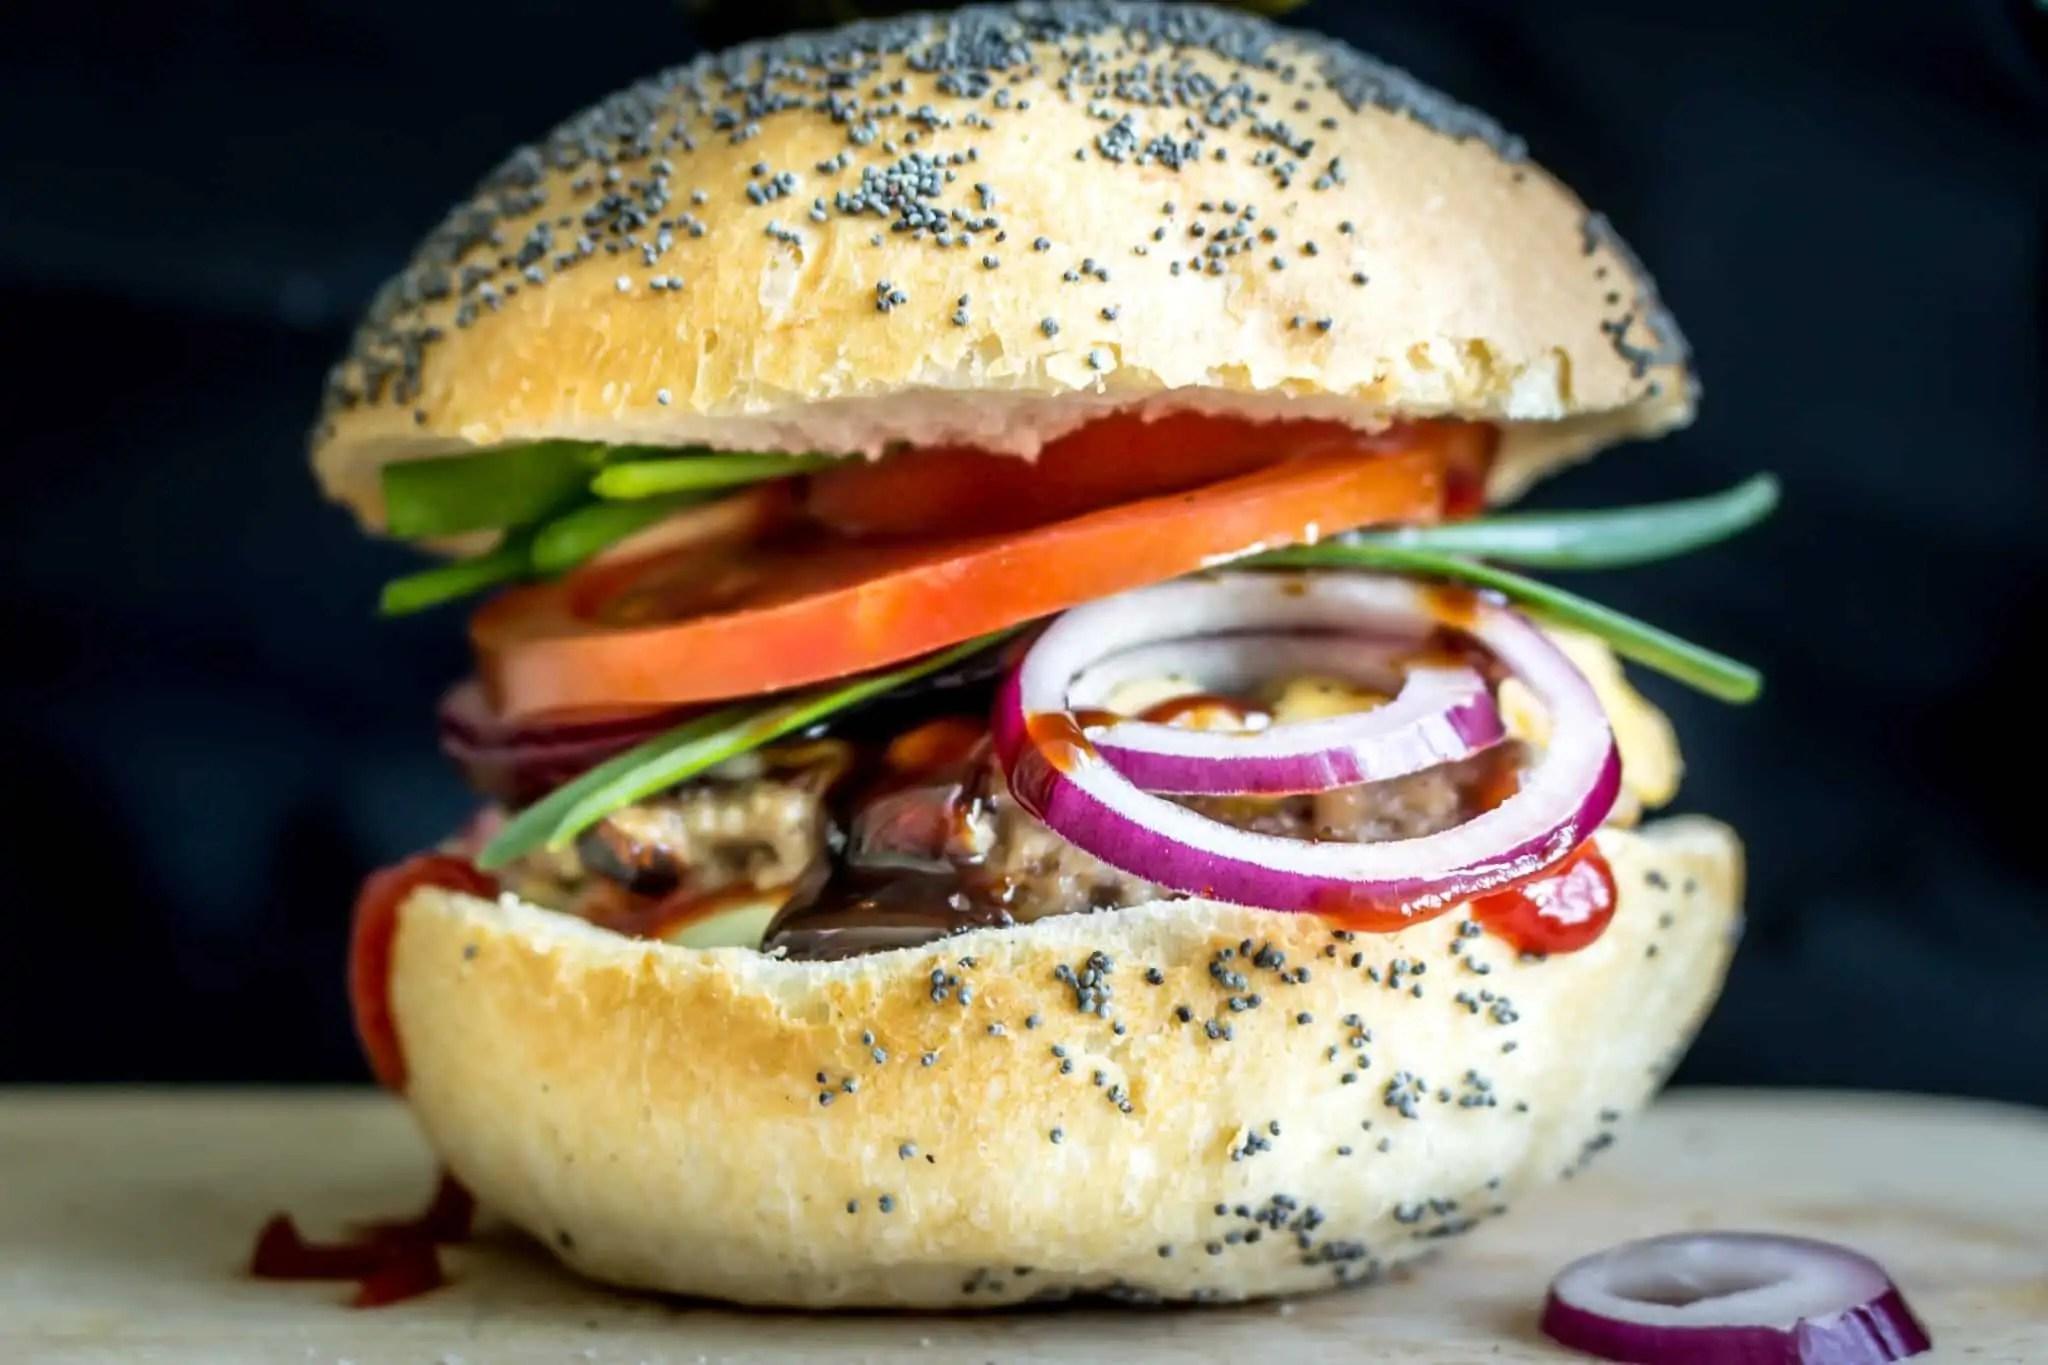 burger 1 scaled - Fotografie do druku